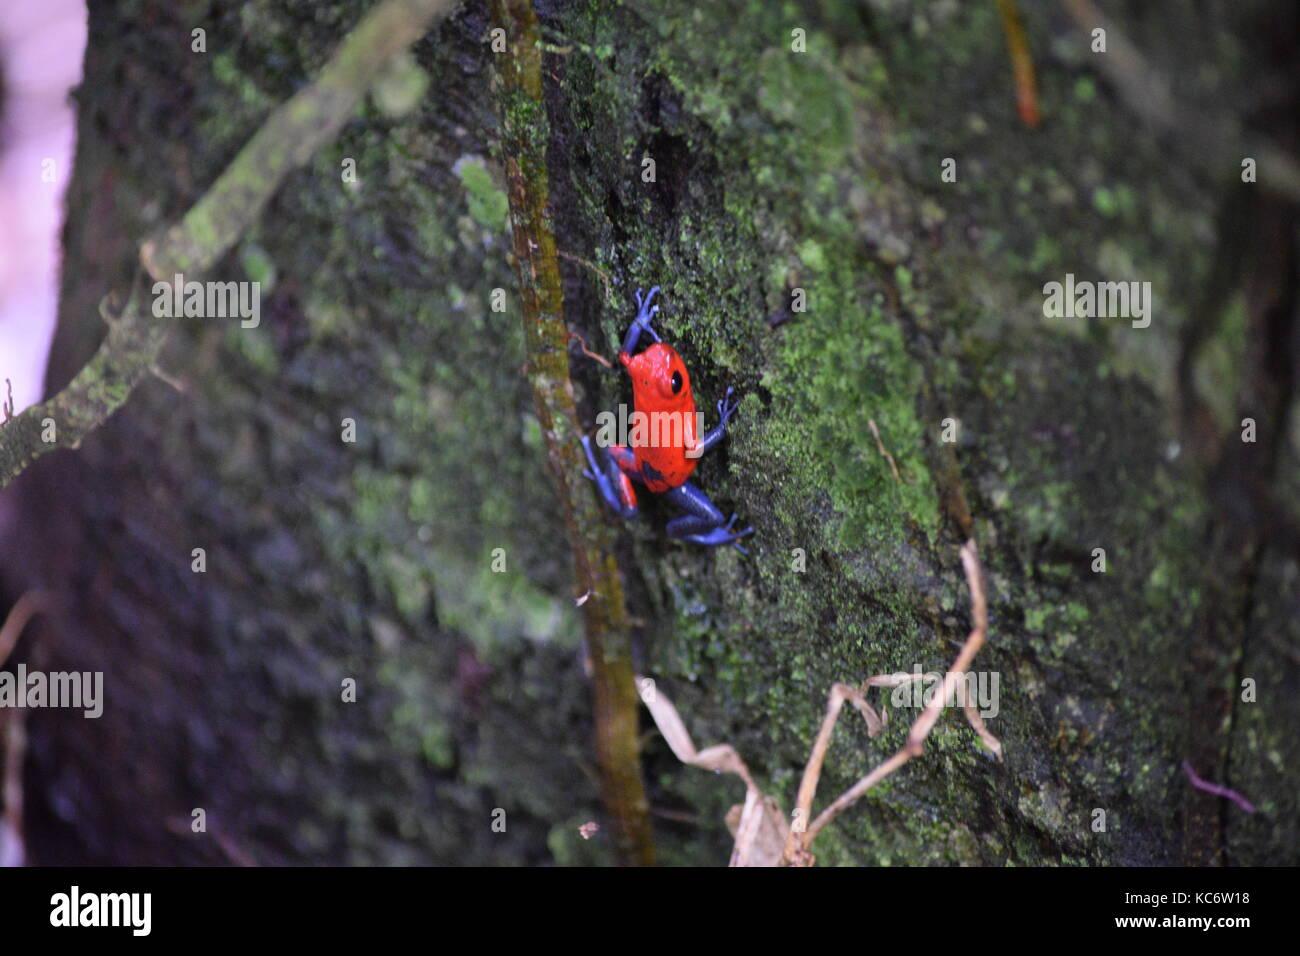 Strawberry Poison Dart Frog, Oophaga pumilio, Tortuguero NP, Costa Rica - Stock Image